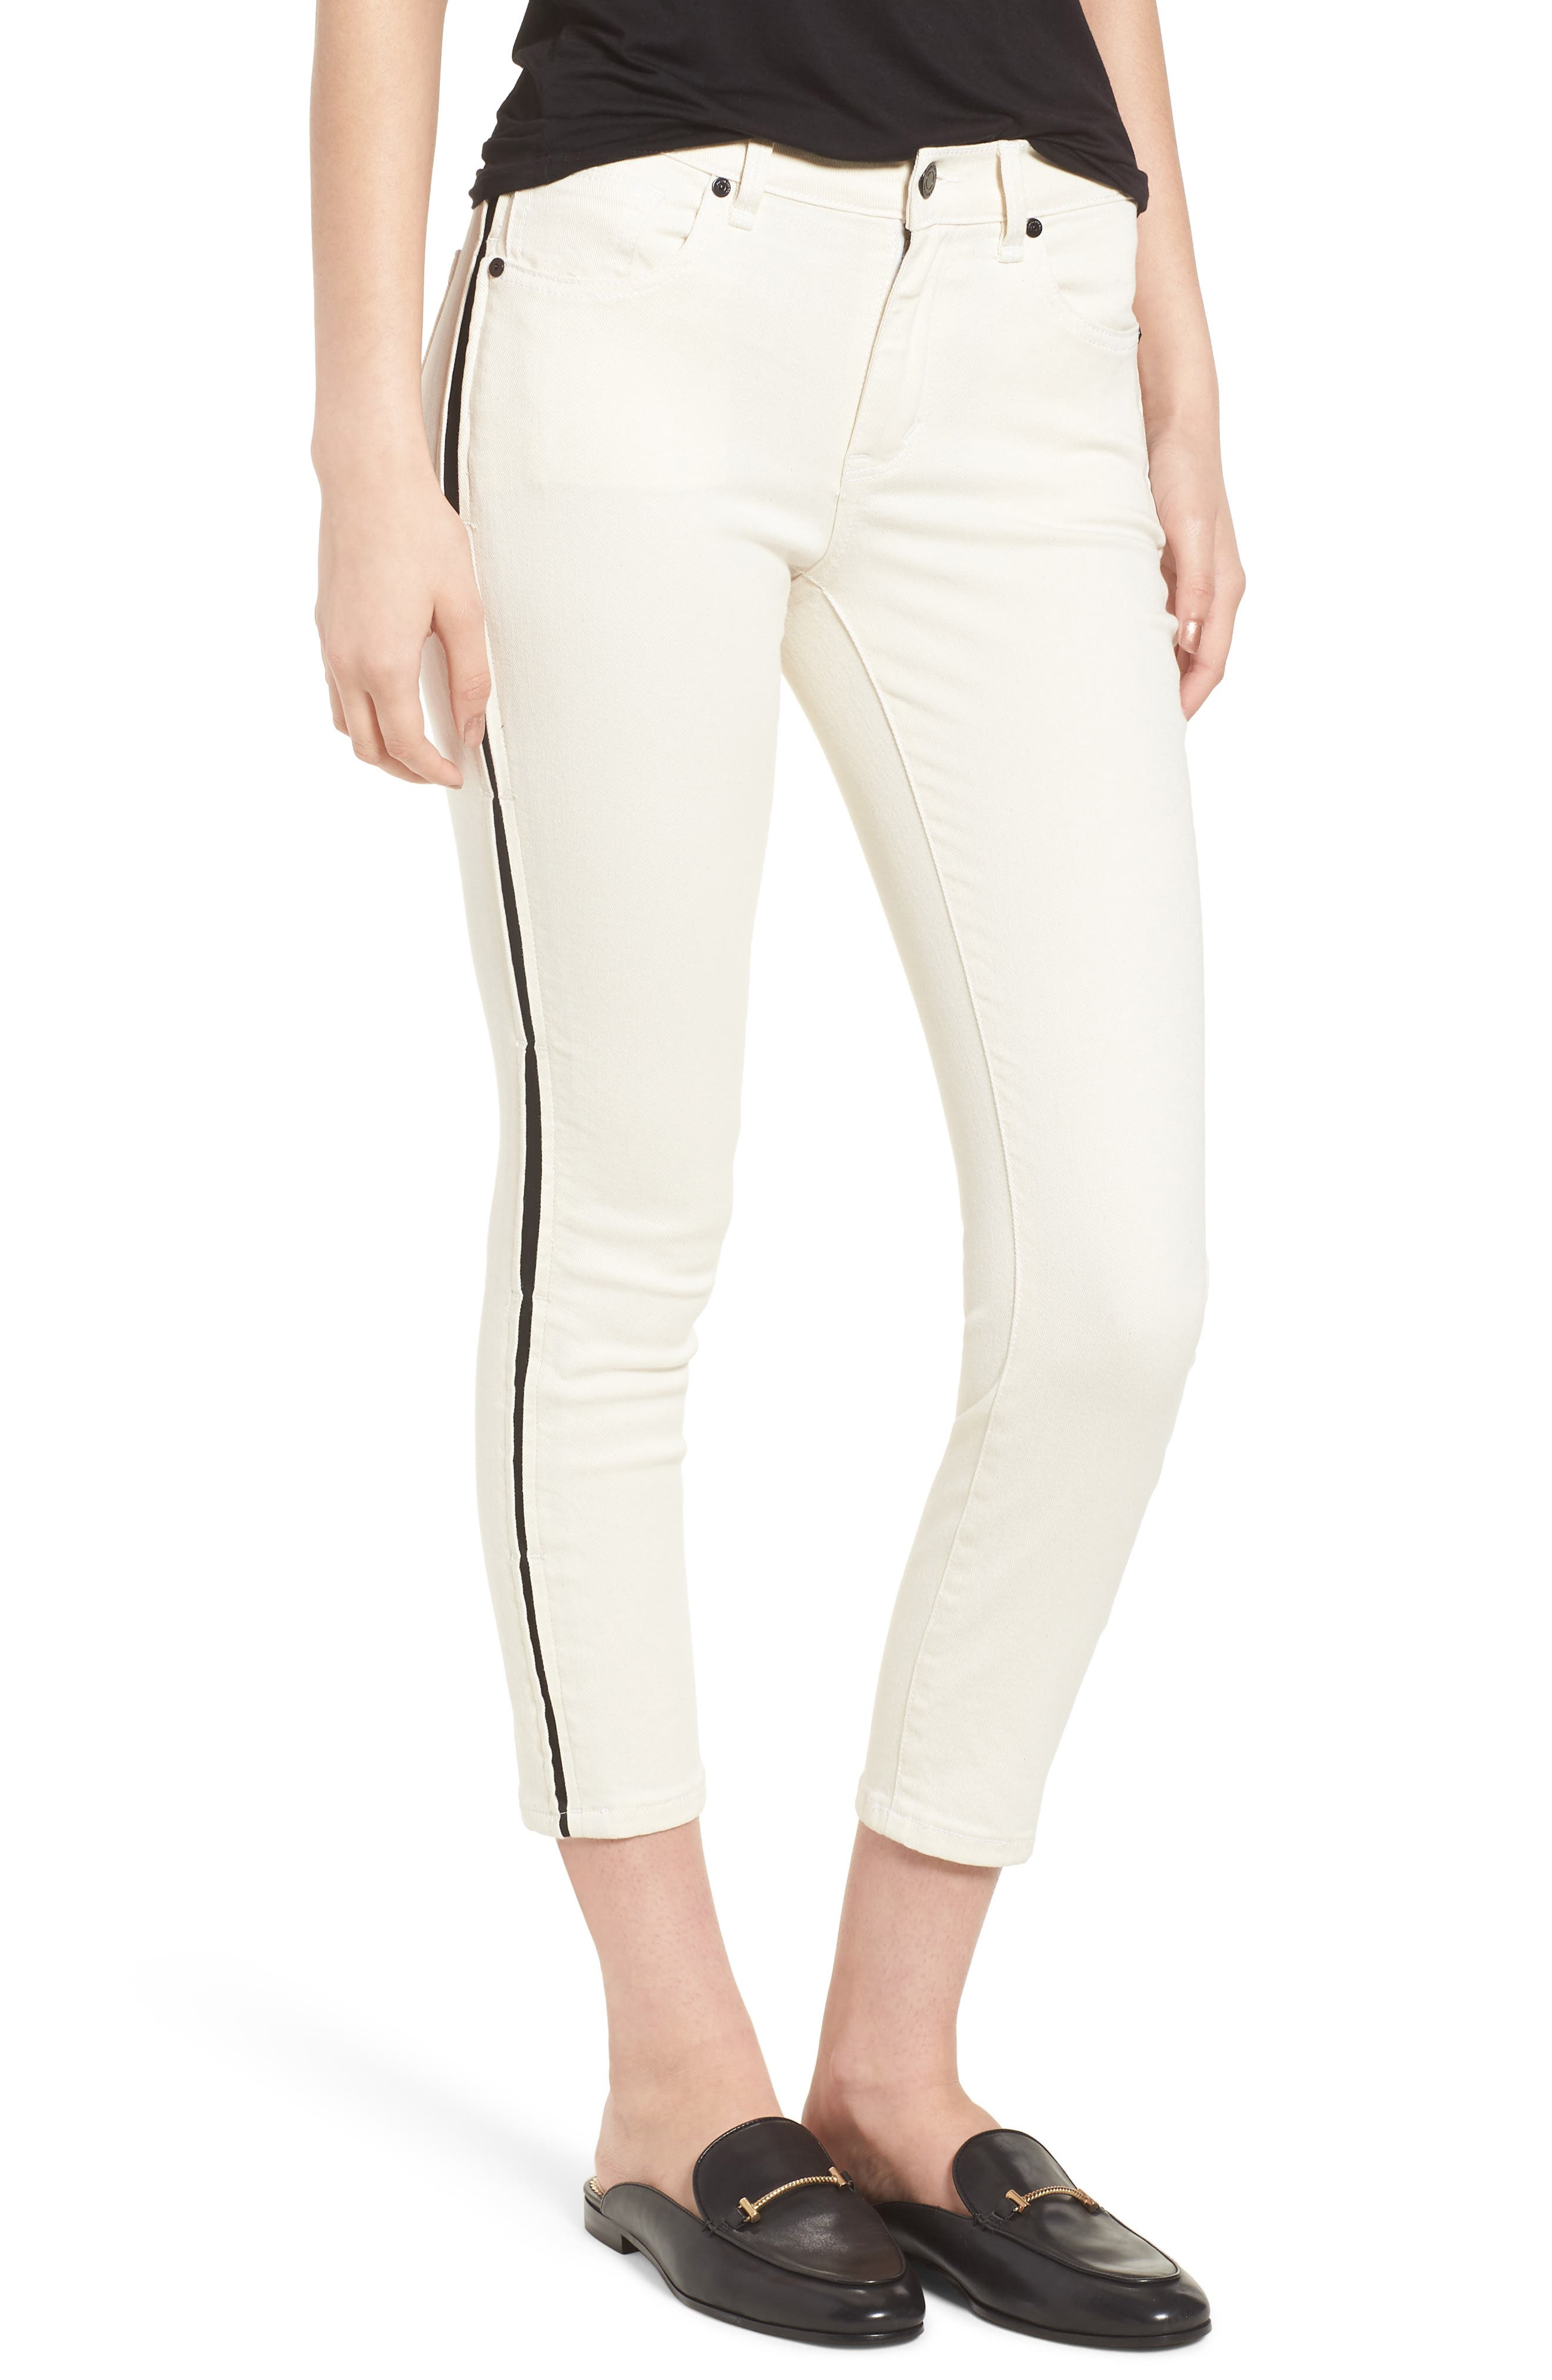 HABITUAL Demi Inset Stripe Skinny Jeans, Main, color, 900